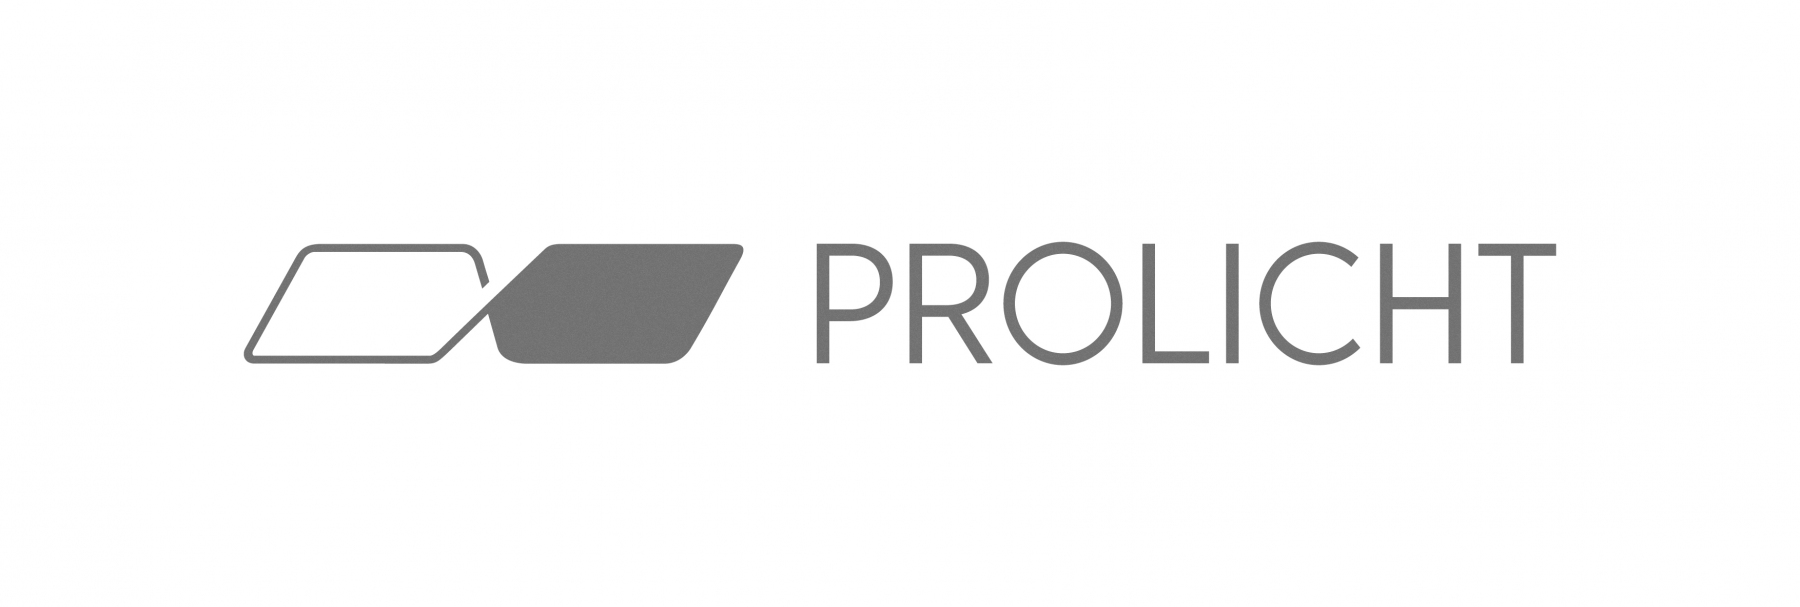 PROLICHT_Logo_1c_positiv